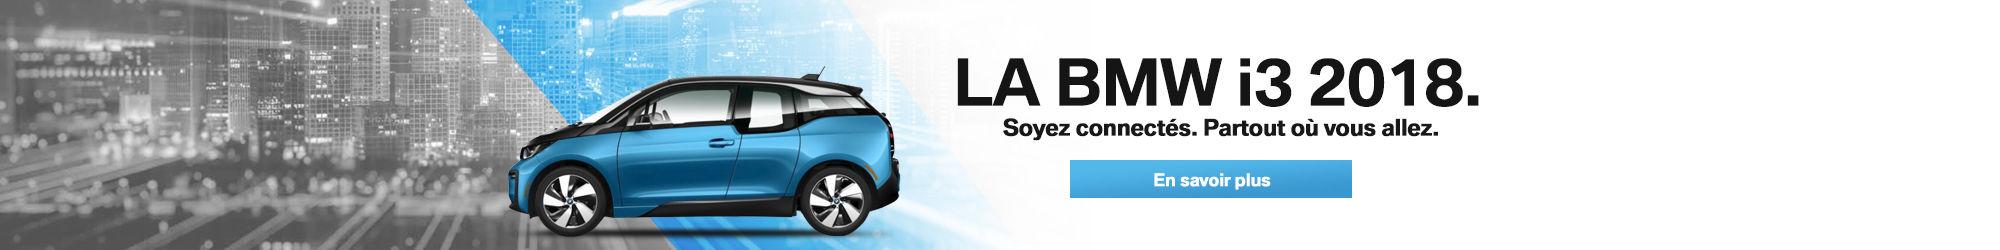 BMW i3 en inventaire (Novembre)